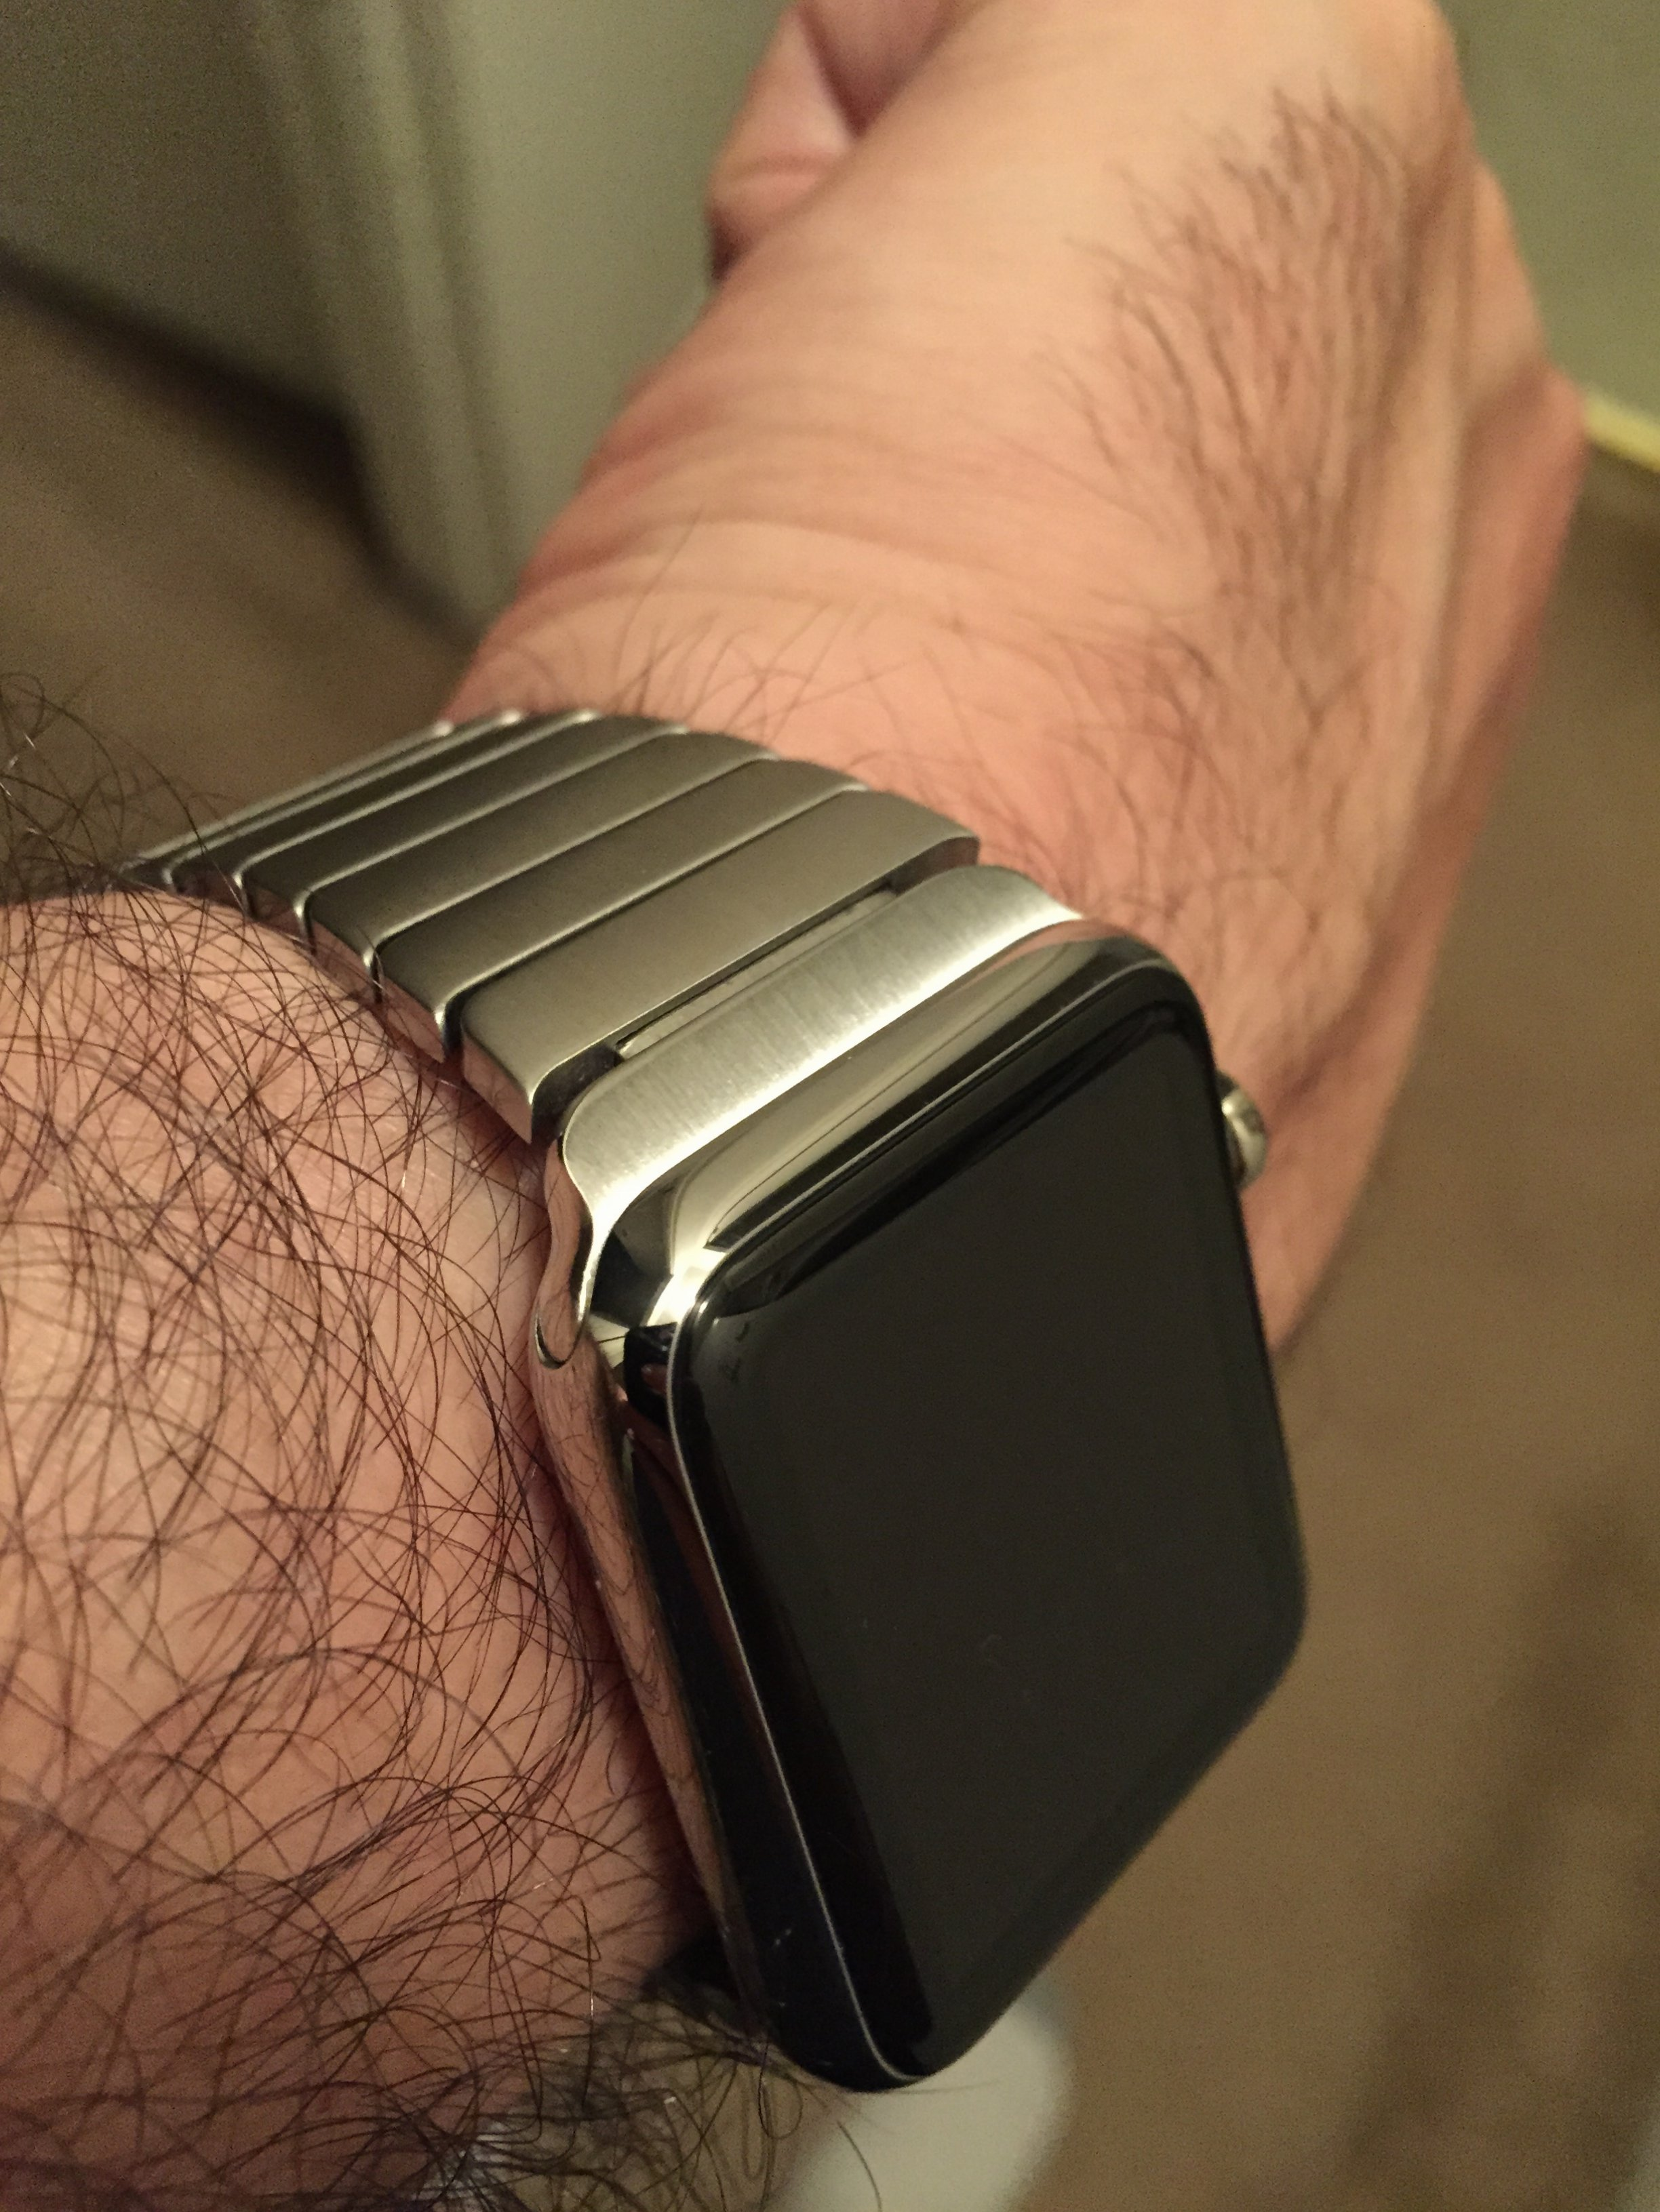 Watch marks on wrist - Img_3073 Jpeg Img_3074 Jpeg Img_3075 Jpeg